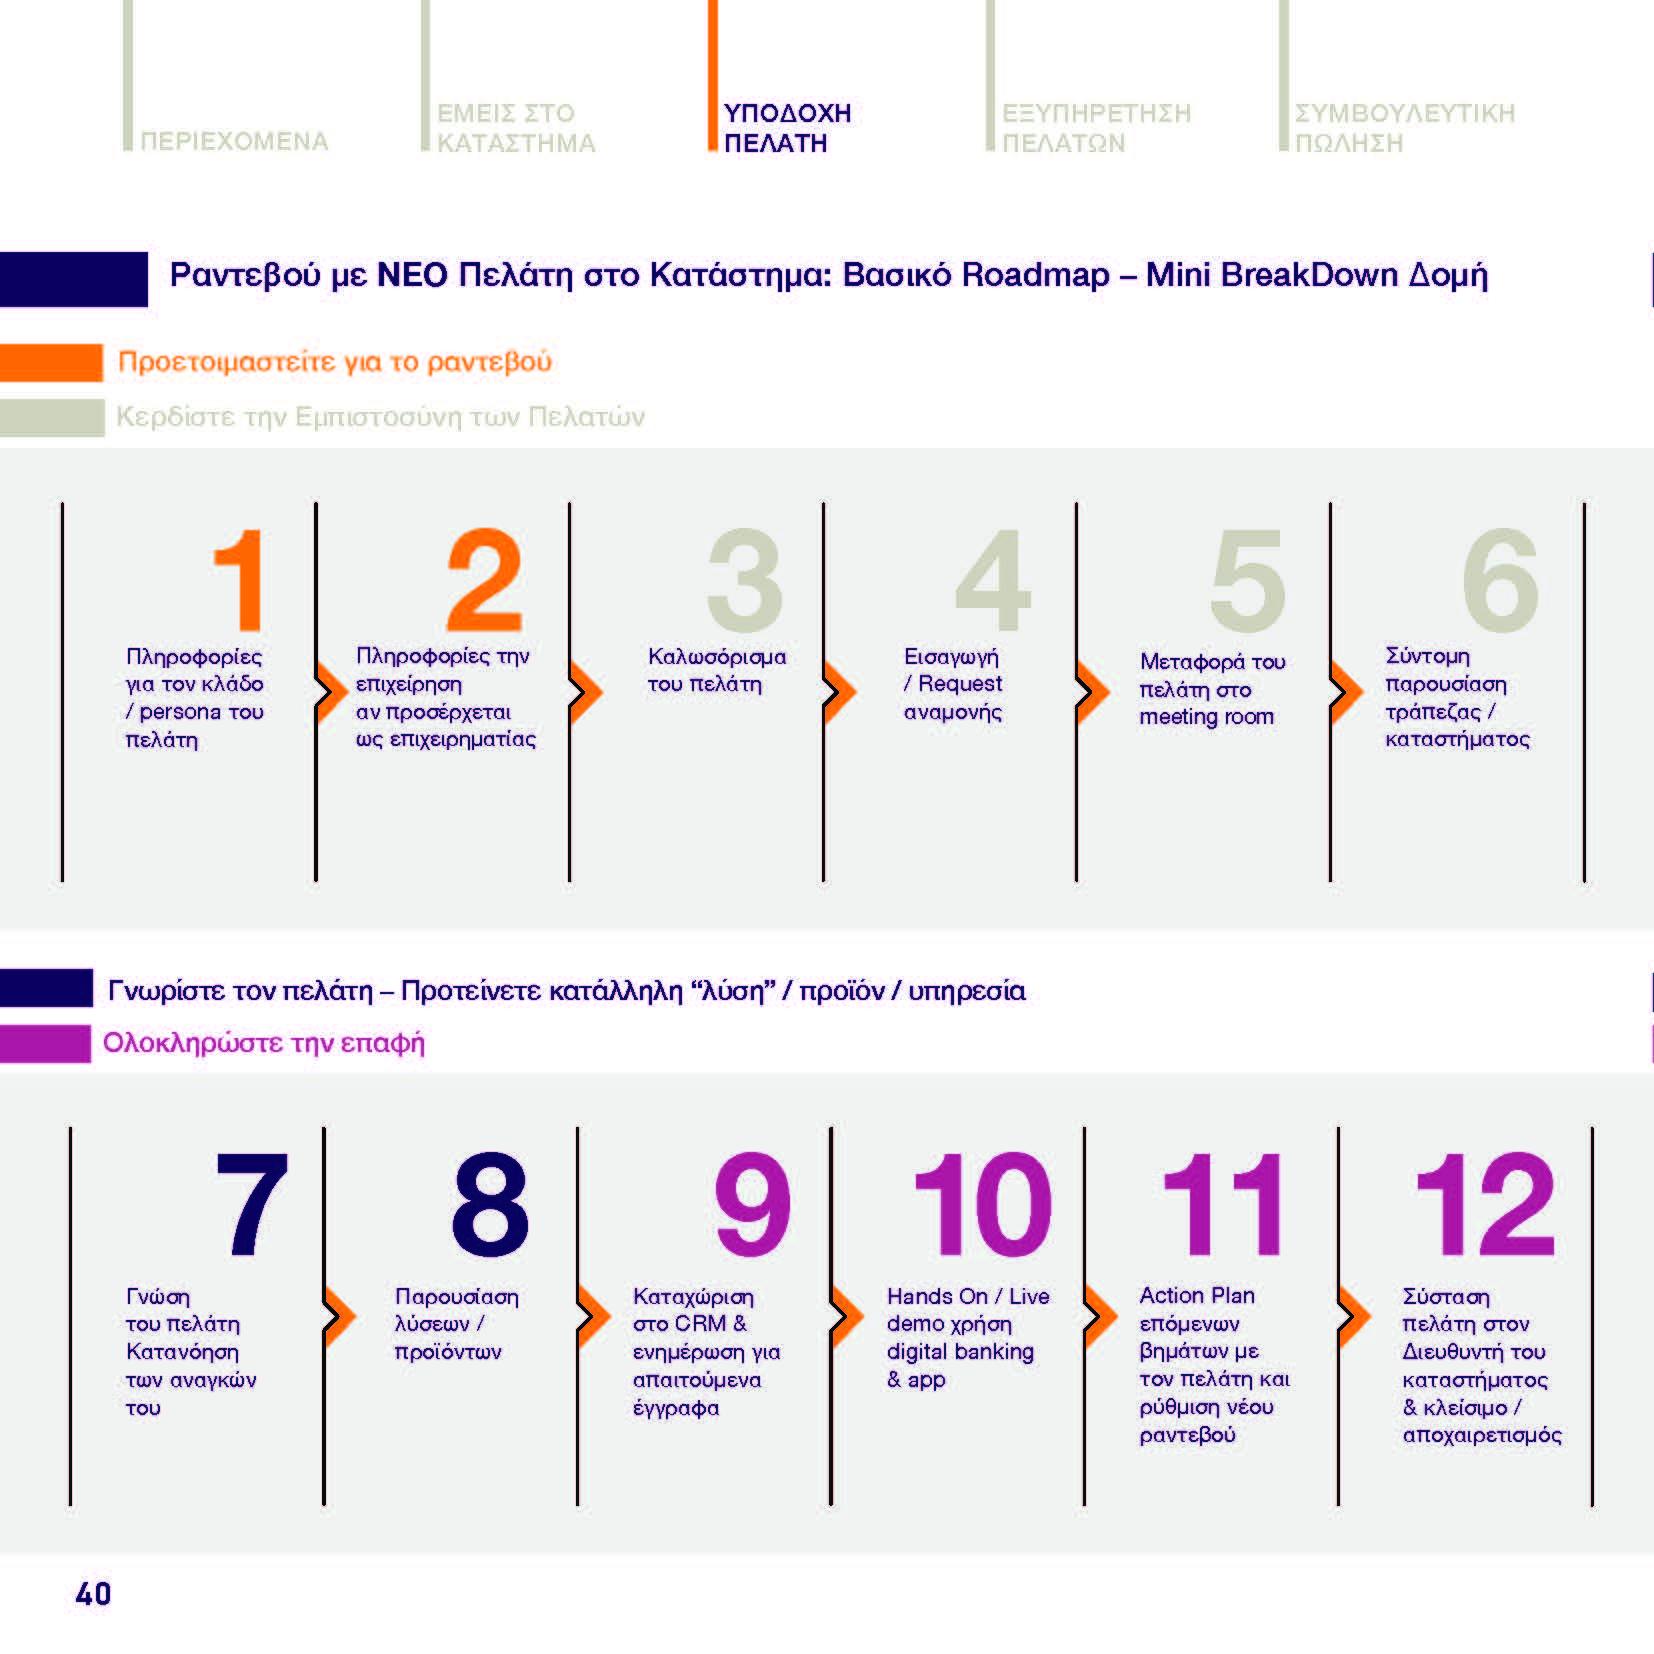 https://www.jib.gr/wp-content/uploads/2020/09/OPTIMA-BANK-BOOKLET-WEB_Page_040.jpg